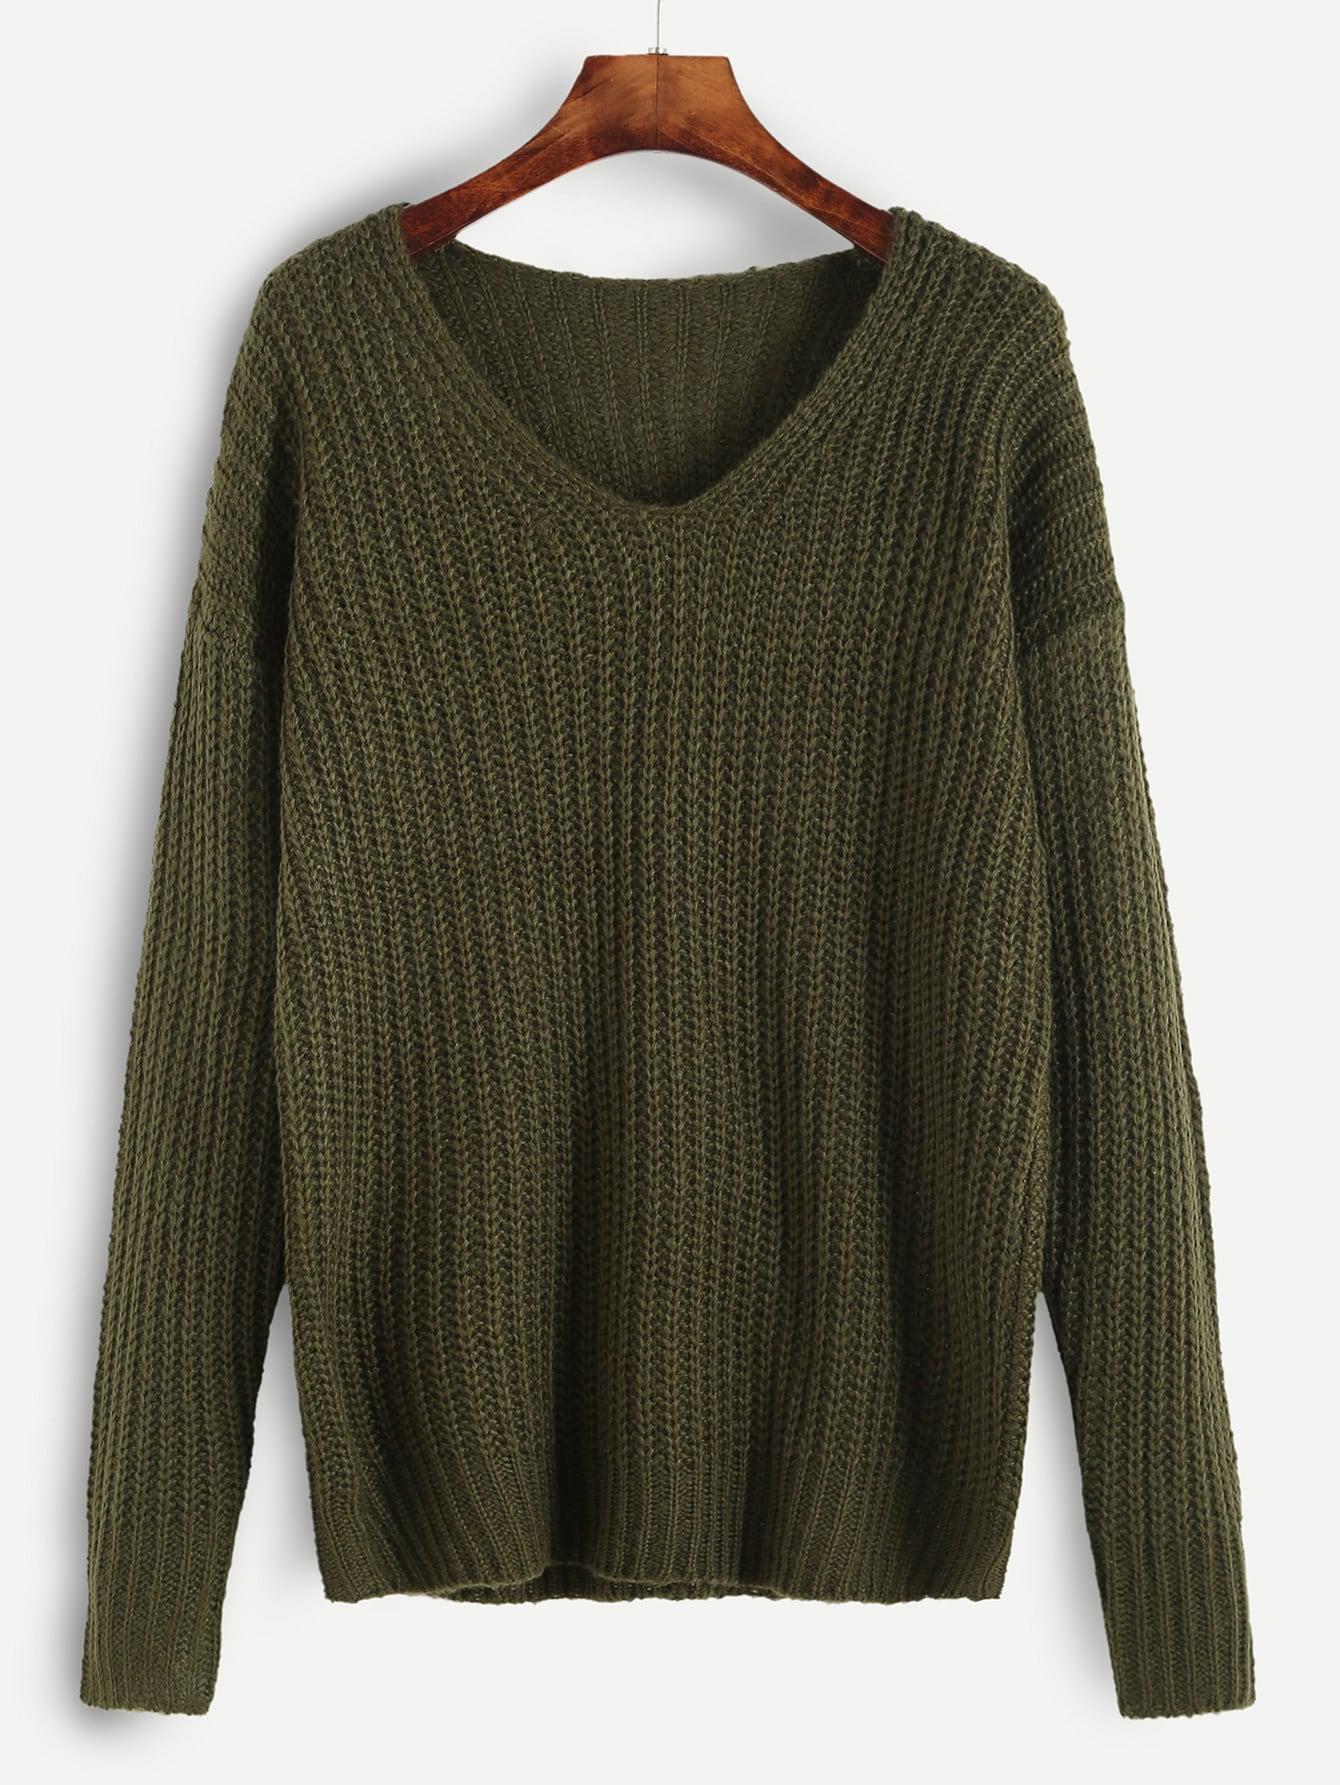 Olive Green Ribbed Knit Drop Shoulder Sweater